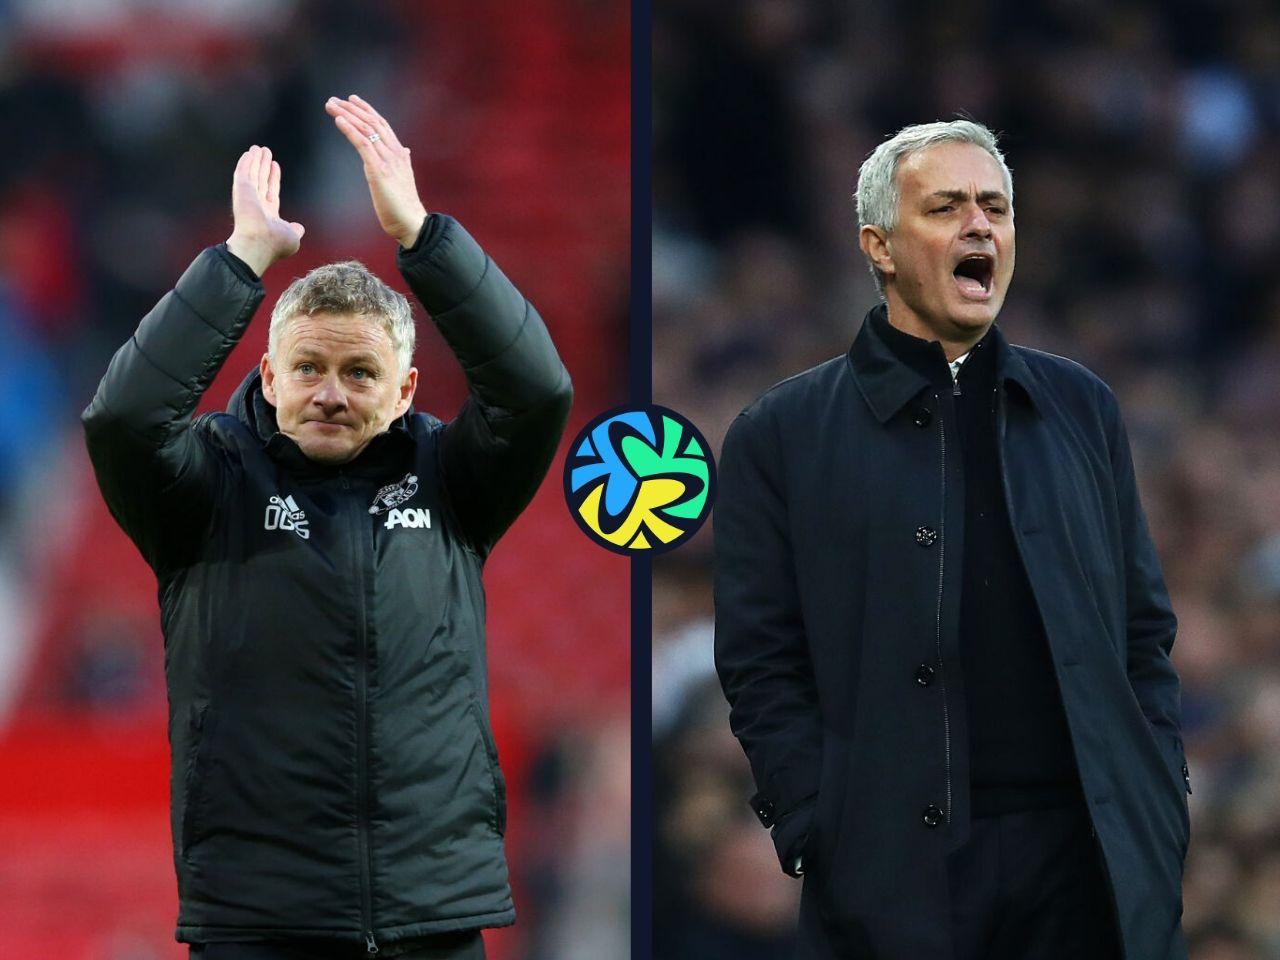 Manchester United, Tottenham Hotspur, Ole Gunnar Solskjaer, Jose Mourinho